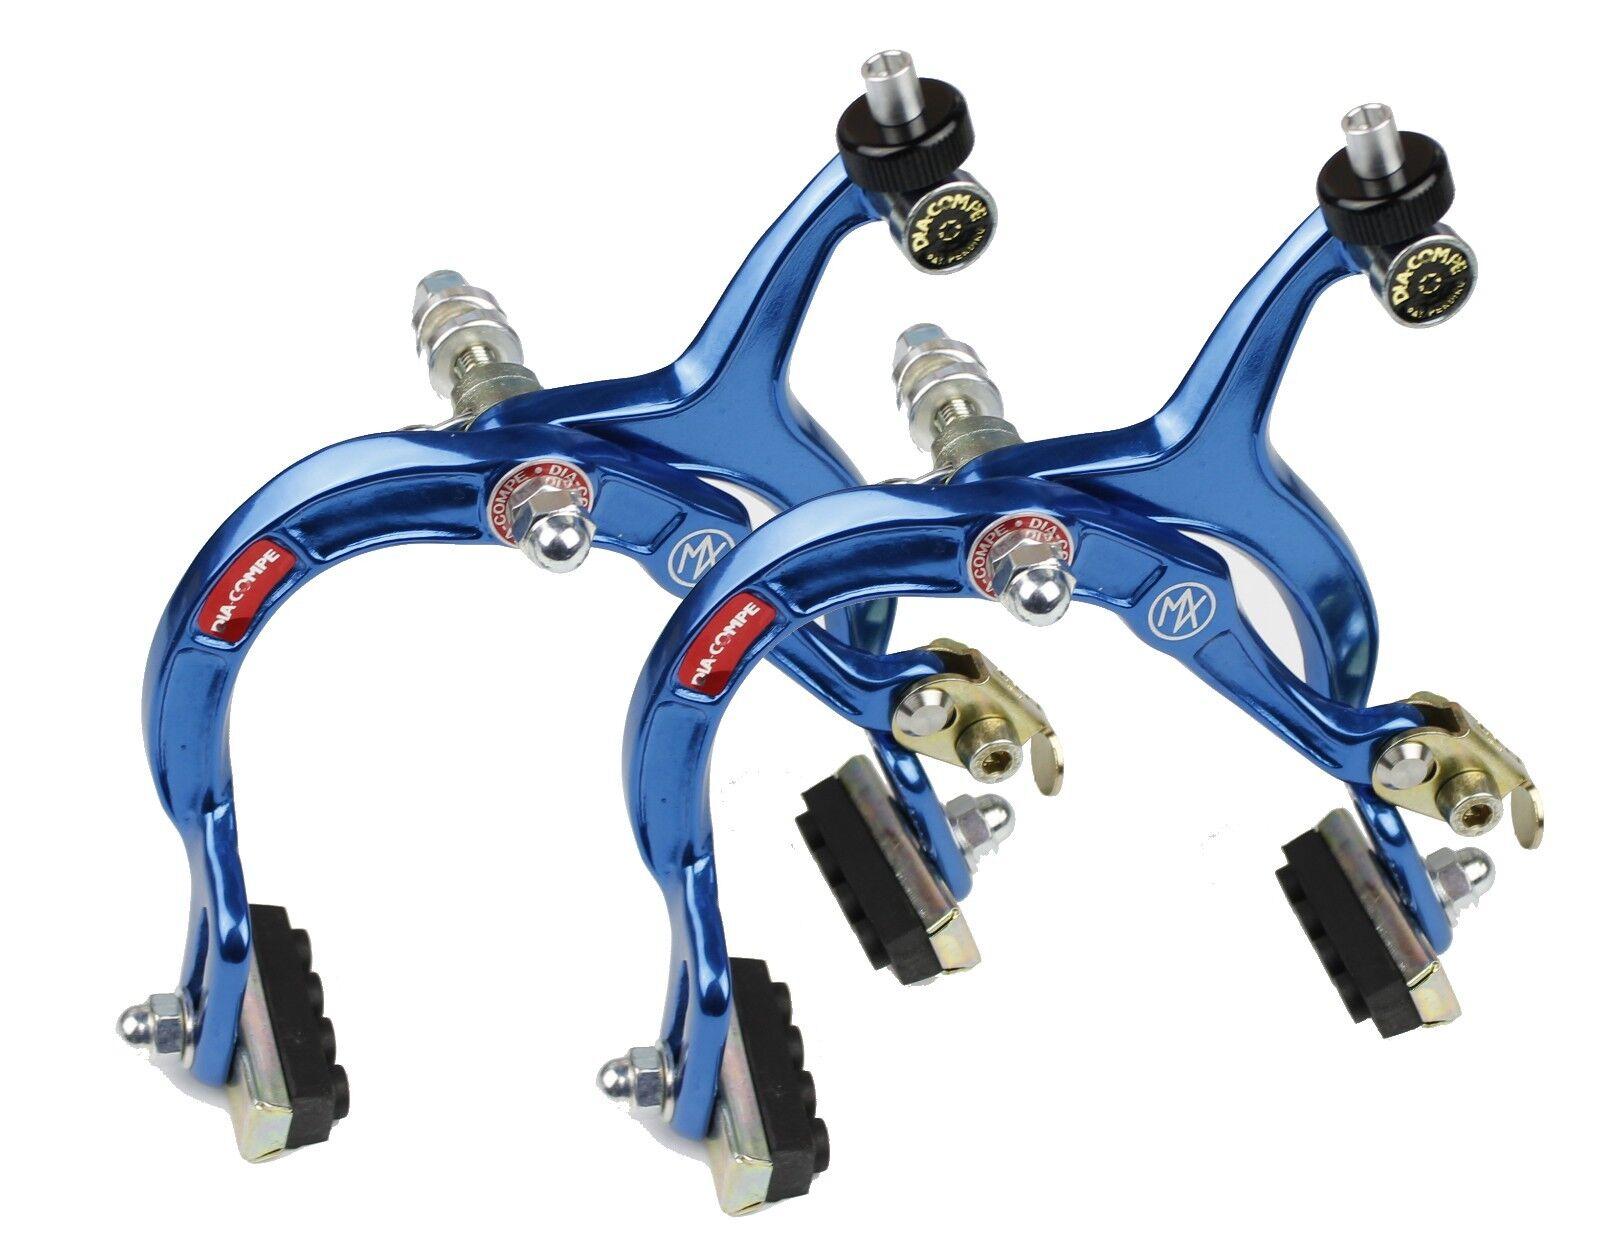 Genuine Dia-Compe MX1000 Dark bluee Brake Calipers Pairs - Old School Retro BMX